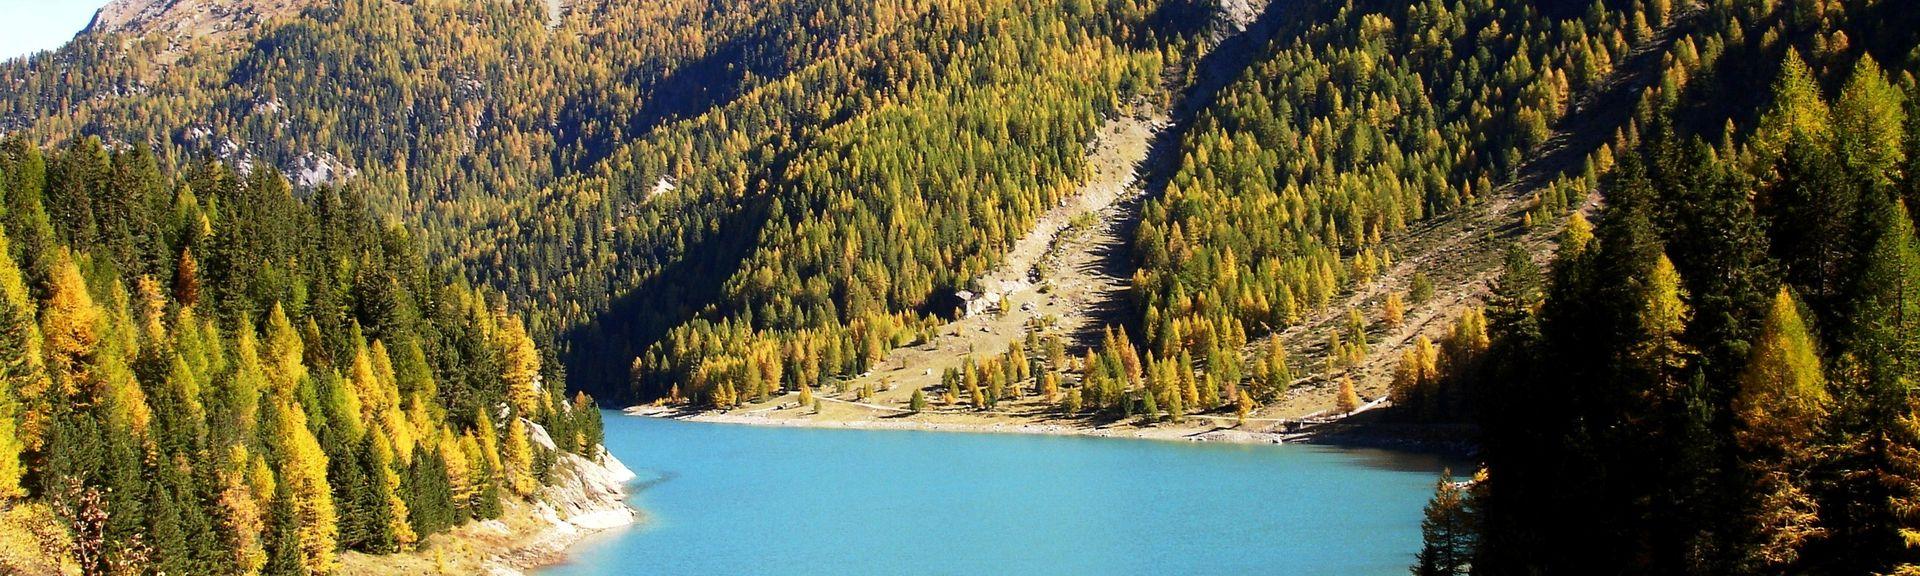 Prato allo Stelvio, Trentino-Zuid-Tirol, Italië